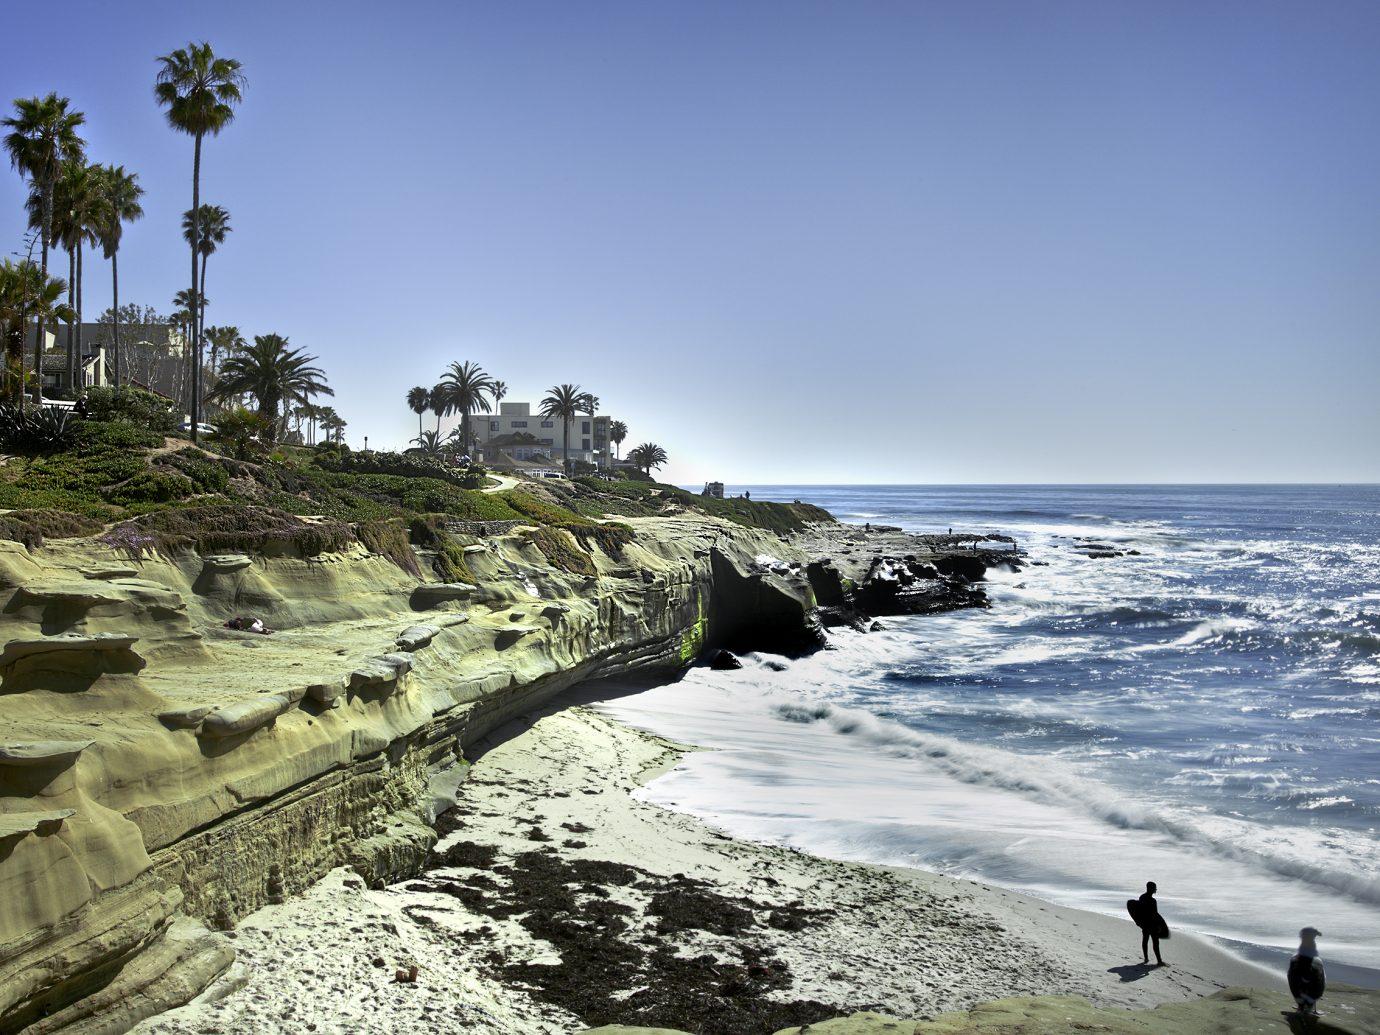 La Jolla Shores Coastline, San Diego California USA